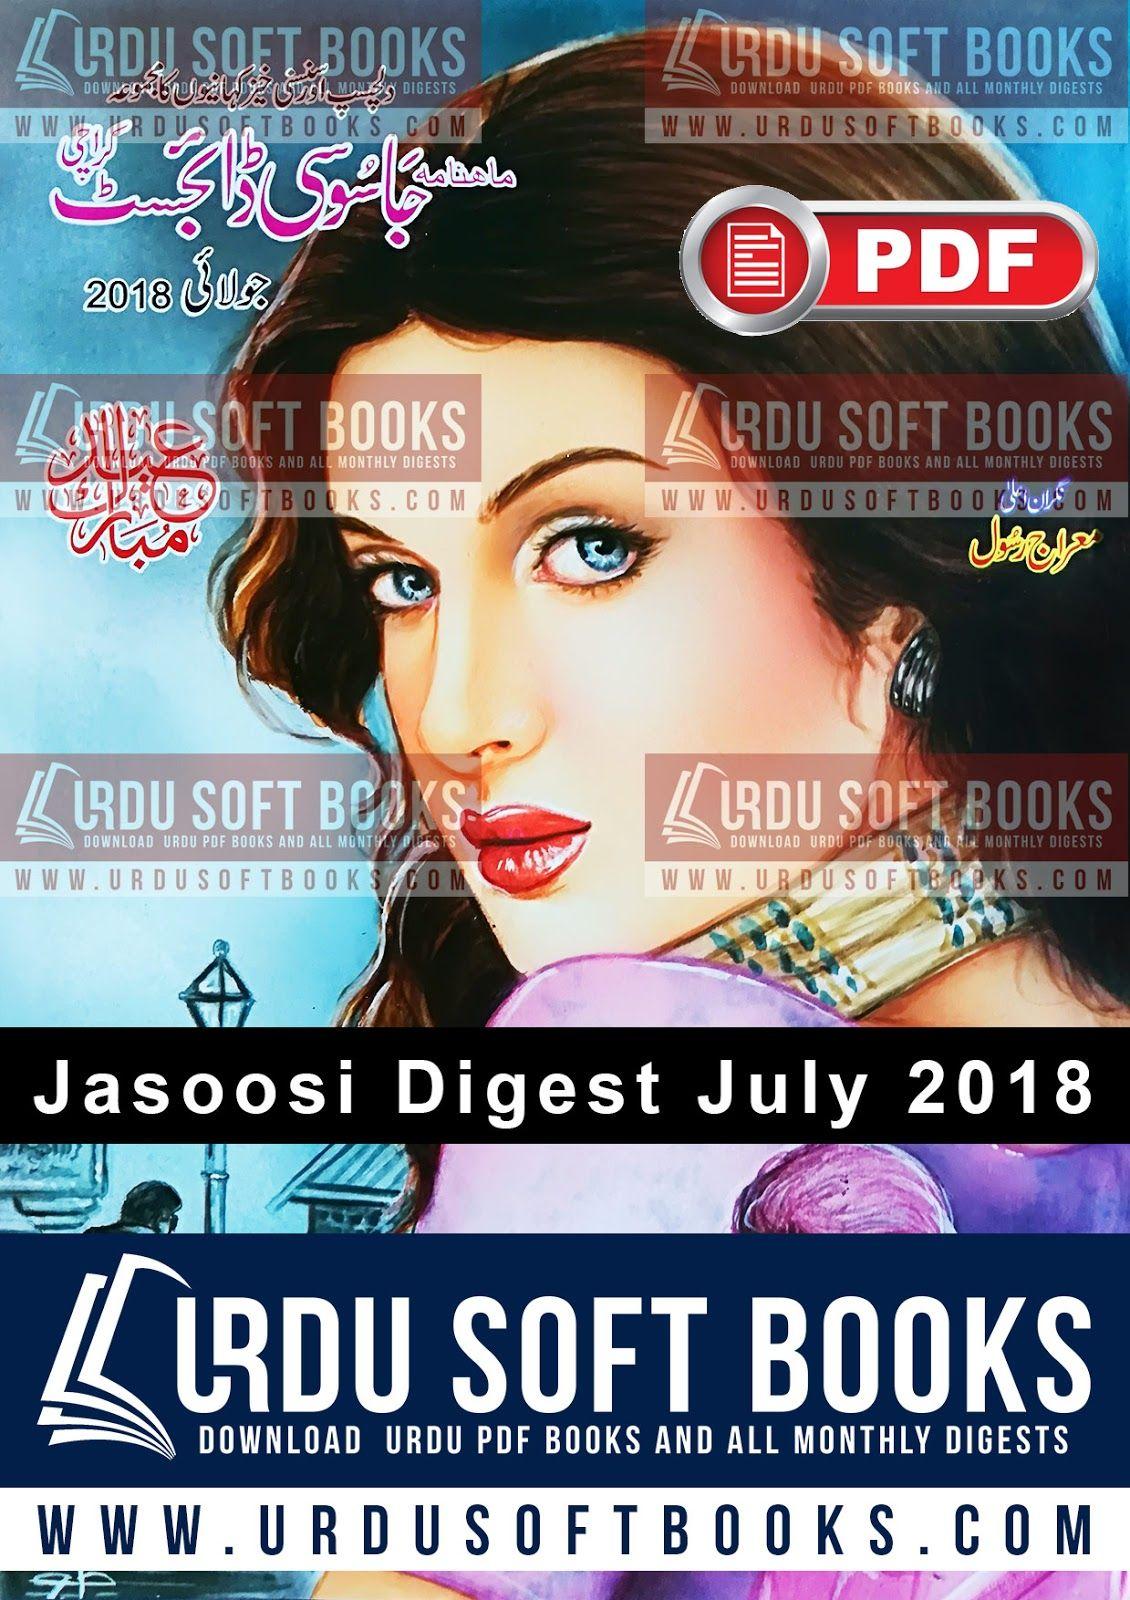 Jasoosi Digest July 2015 Pdf